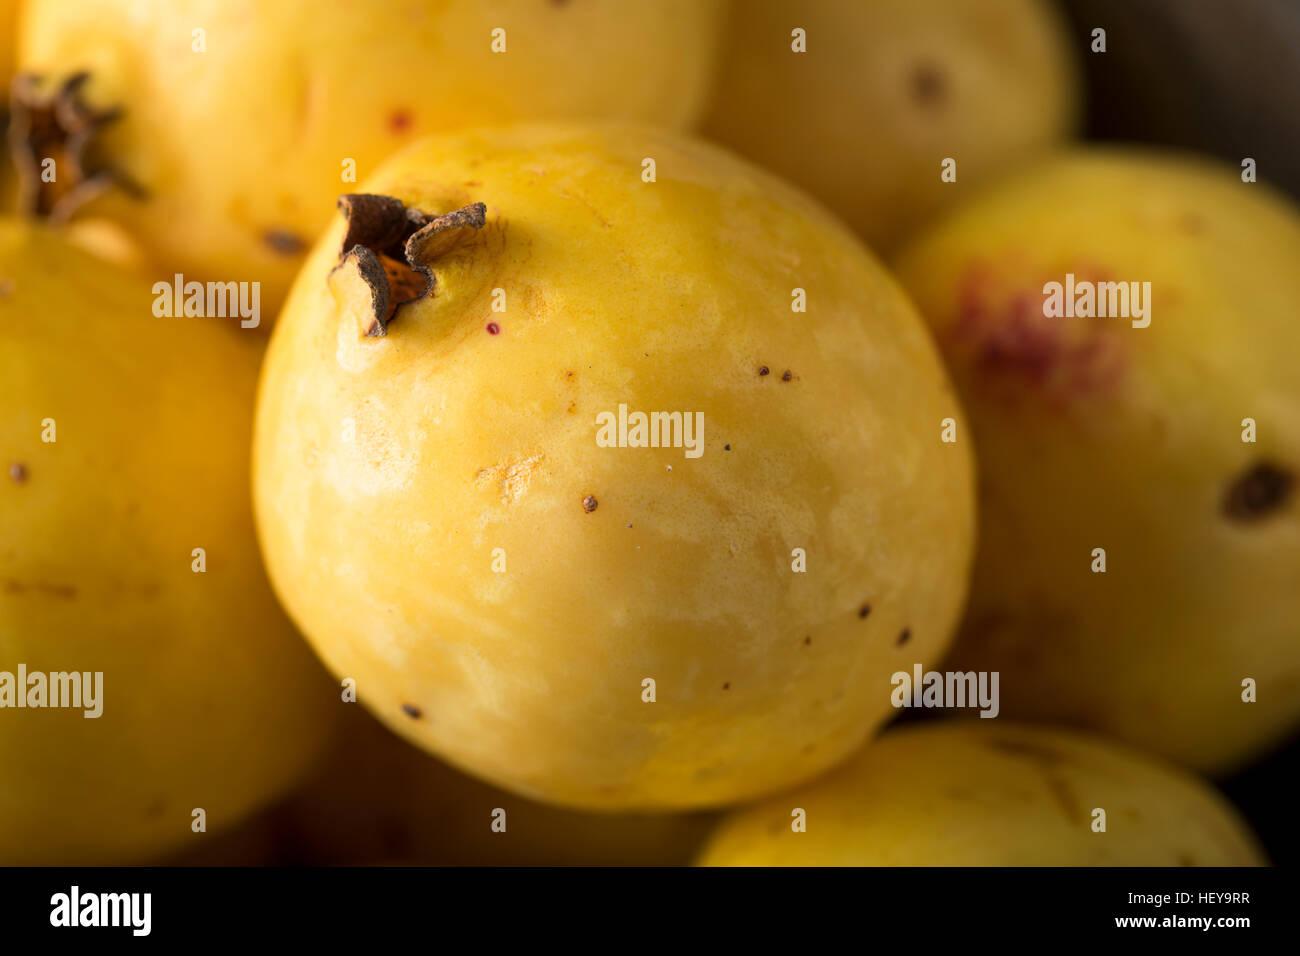 Rawanic Yellow Guava Fruit Ready To Eat